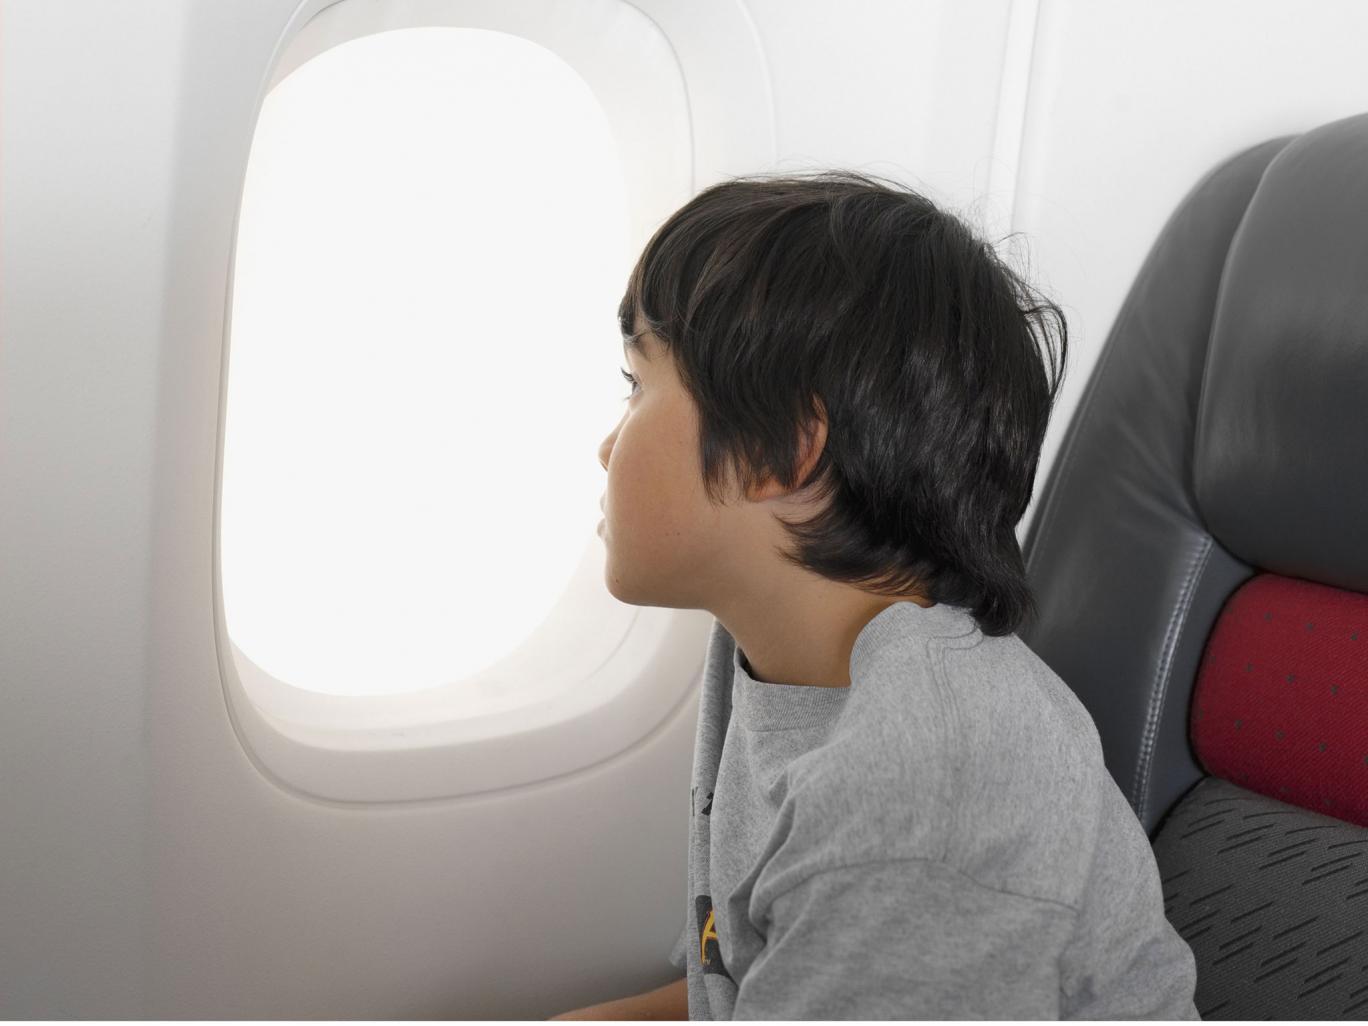 10-plane-passenger-rex